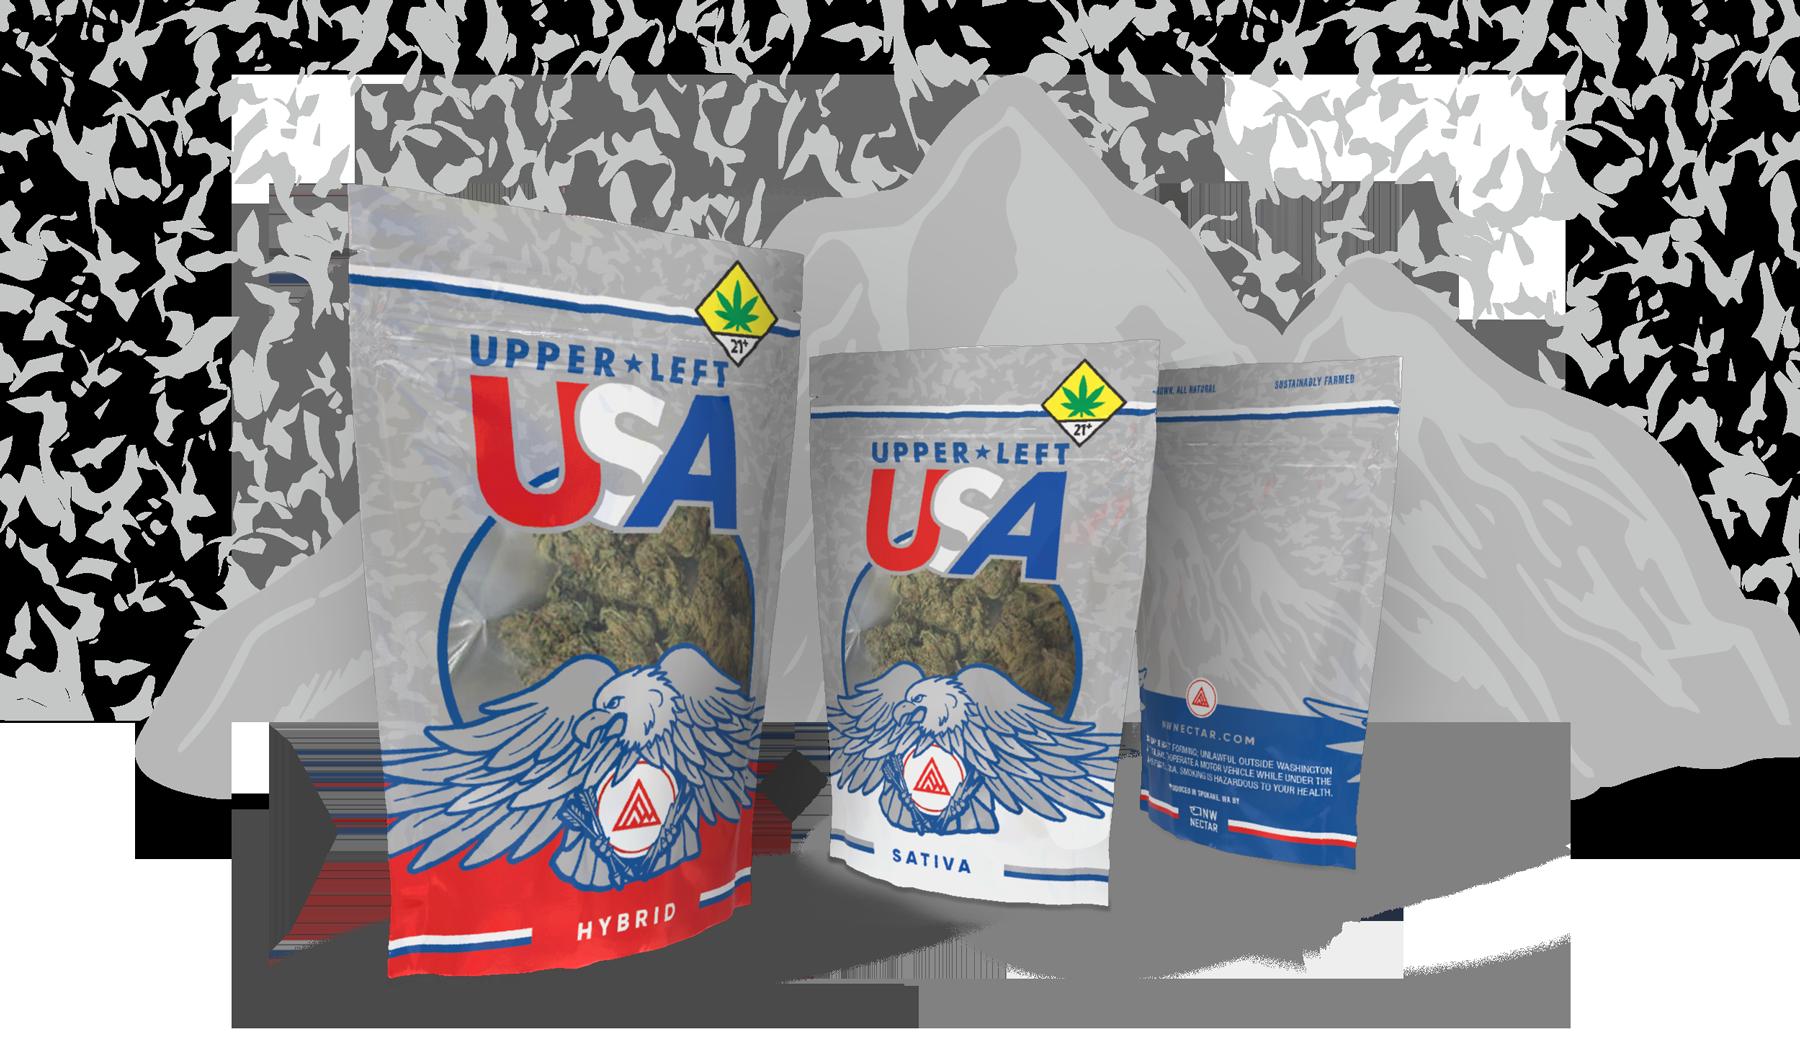 upperleftpackages.png